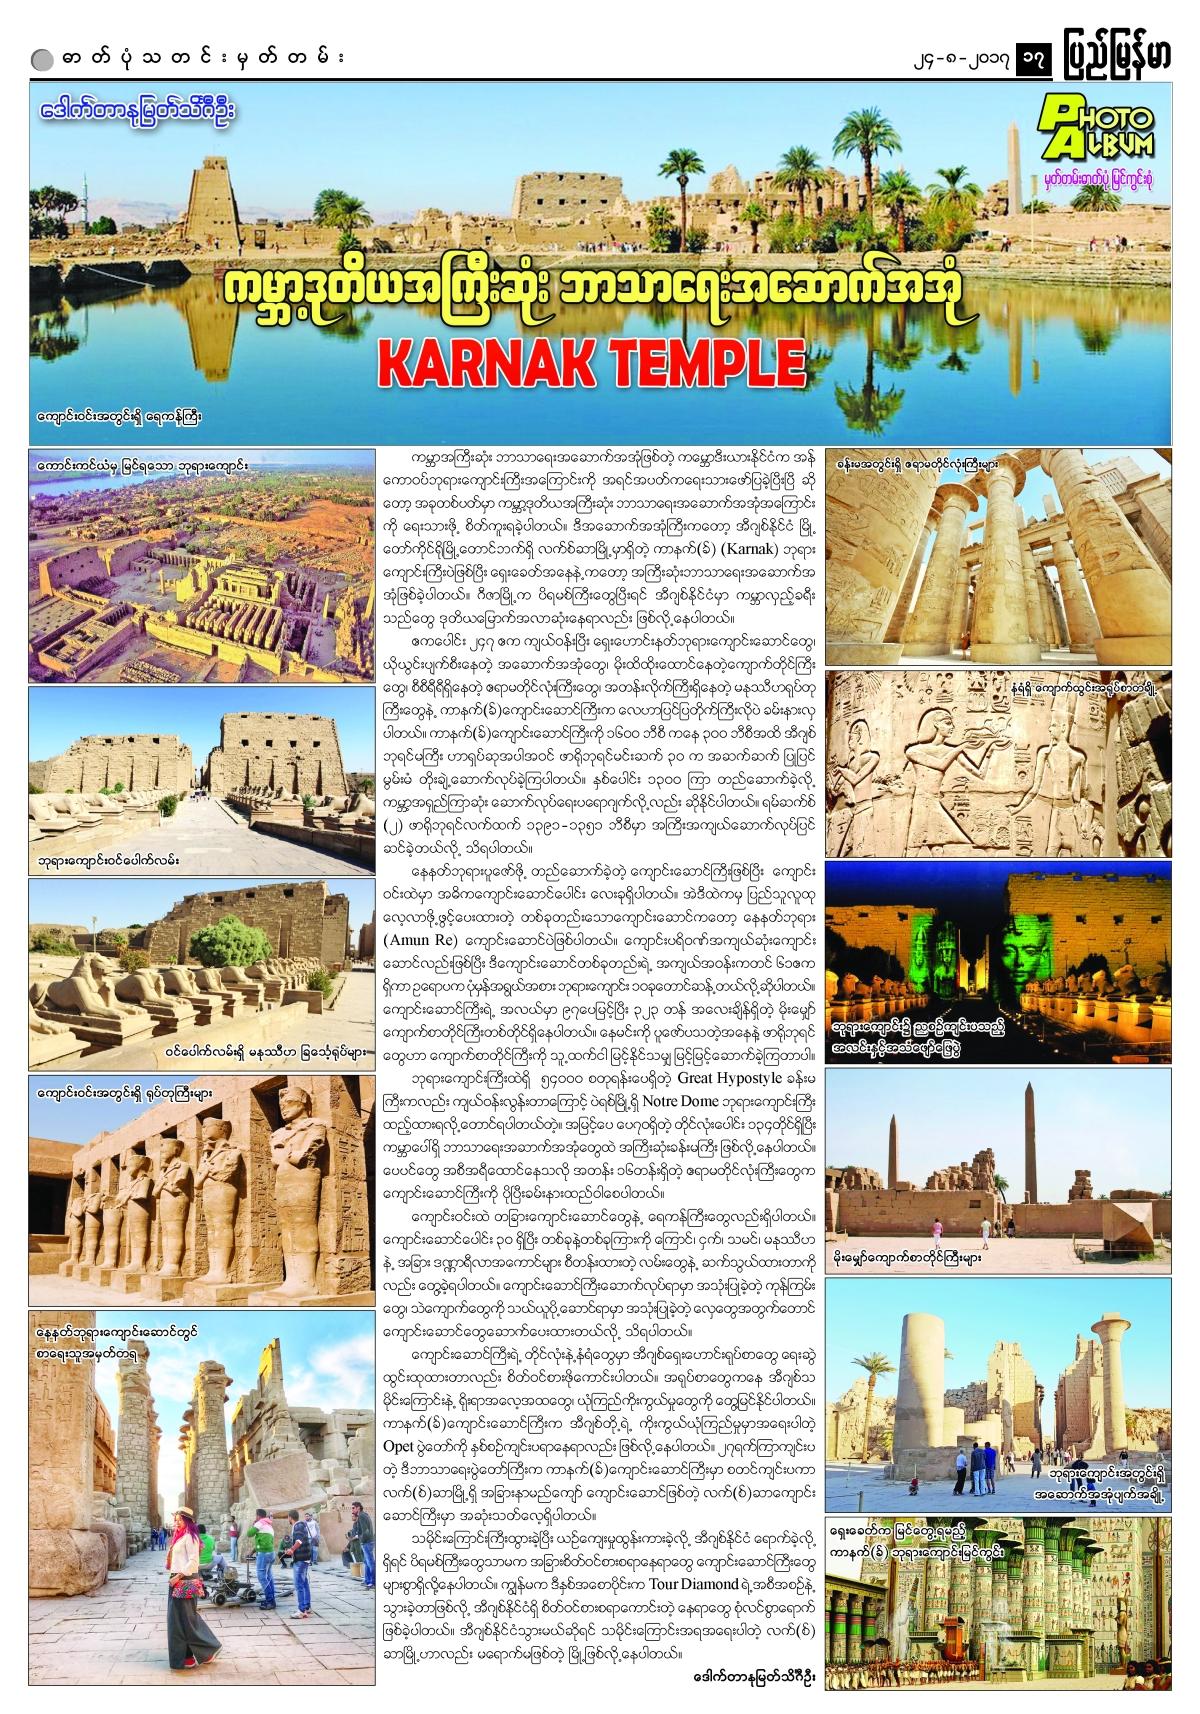 1089 Karnak Temple.jpg